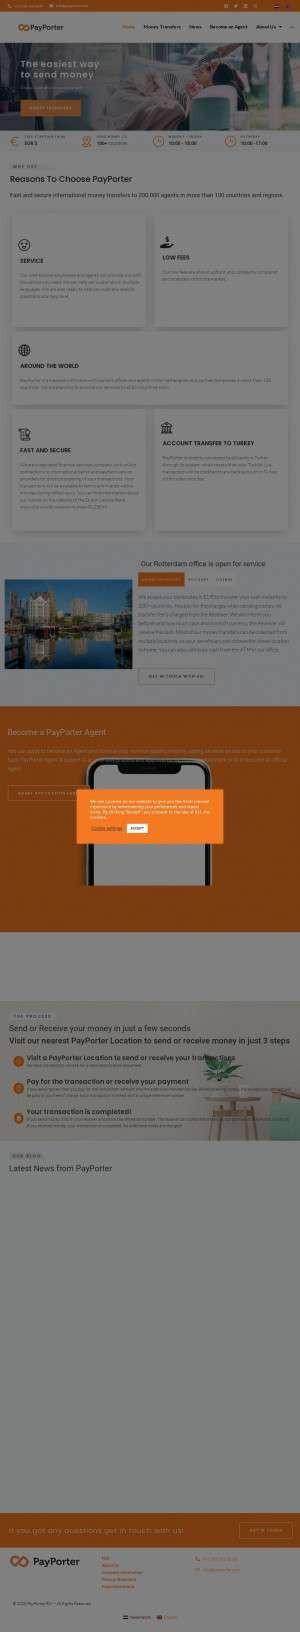 Предпросмотр для www.payporter.com — PayPorter Aksaray ubesi